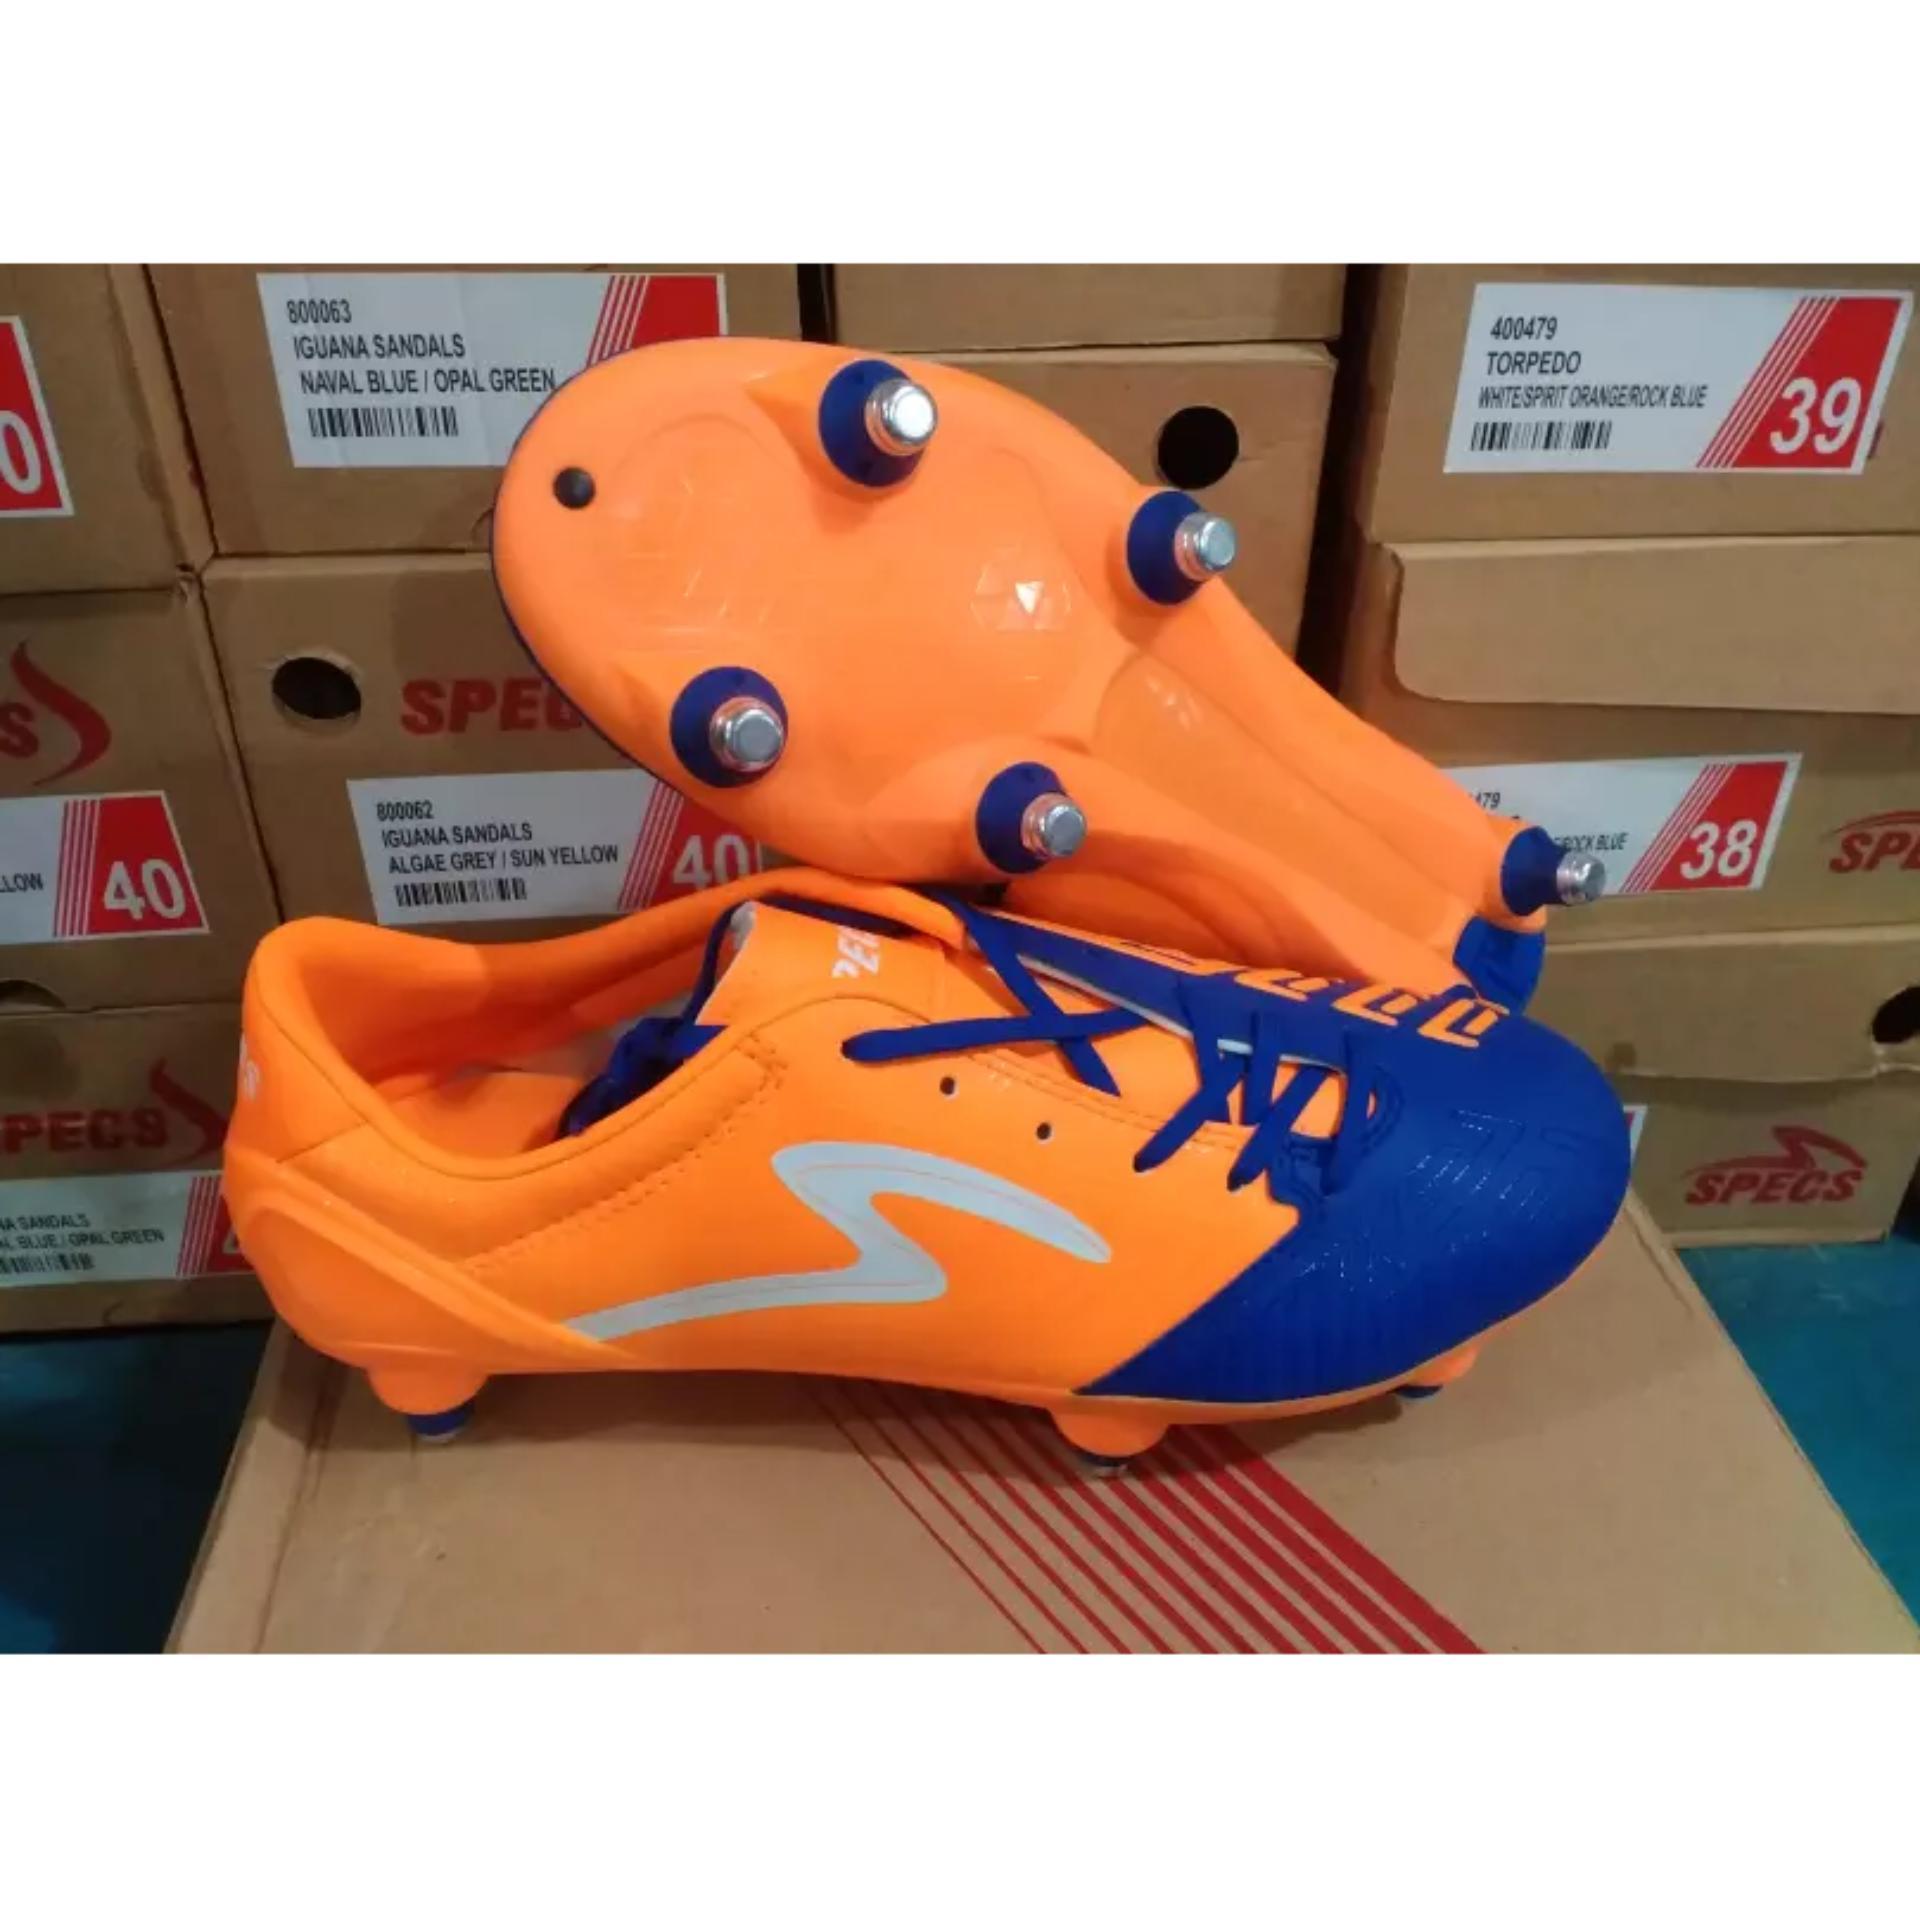 Harga Saya Sepatu Bola Specs Swervo Criollo Sg Pencari